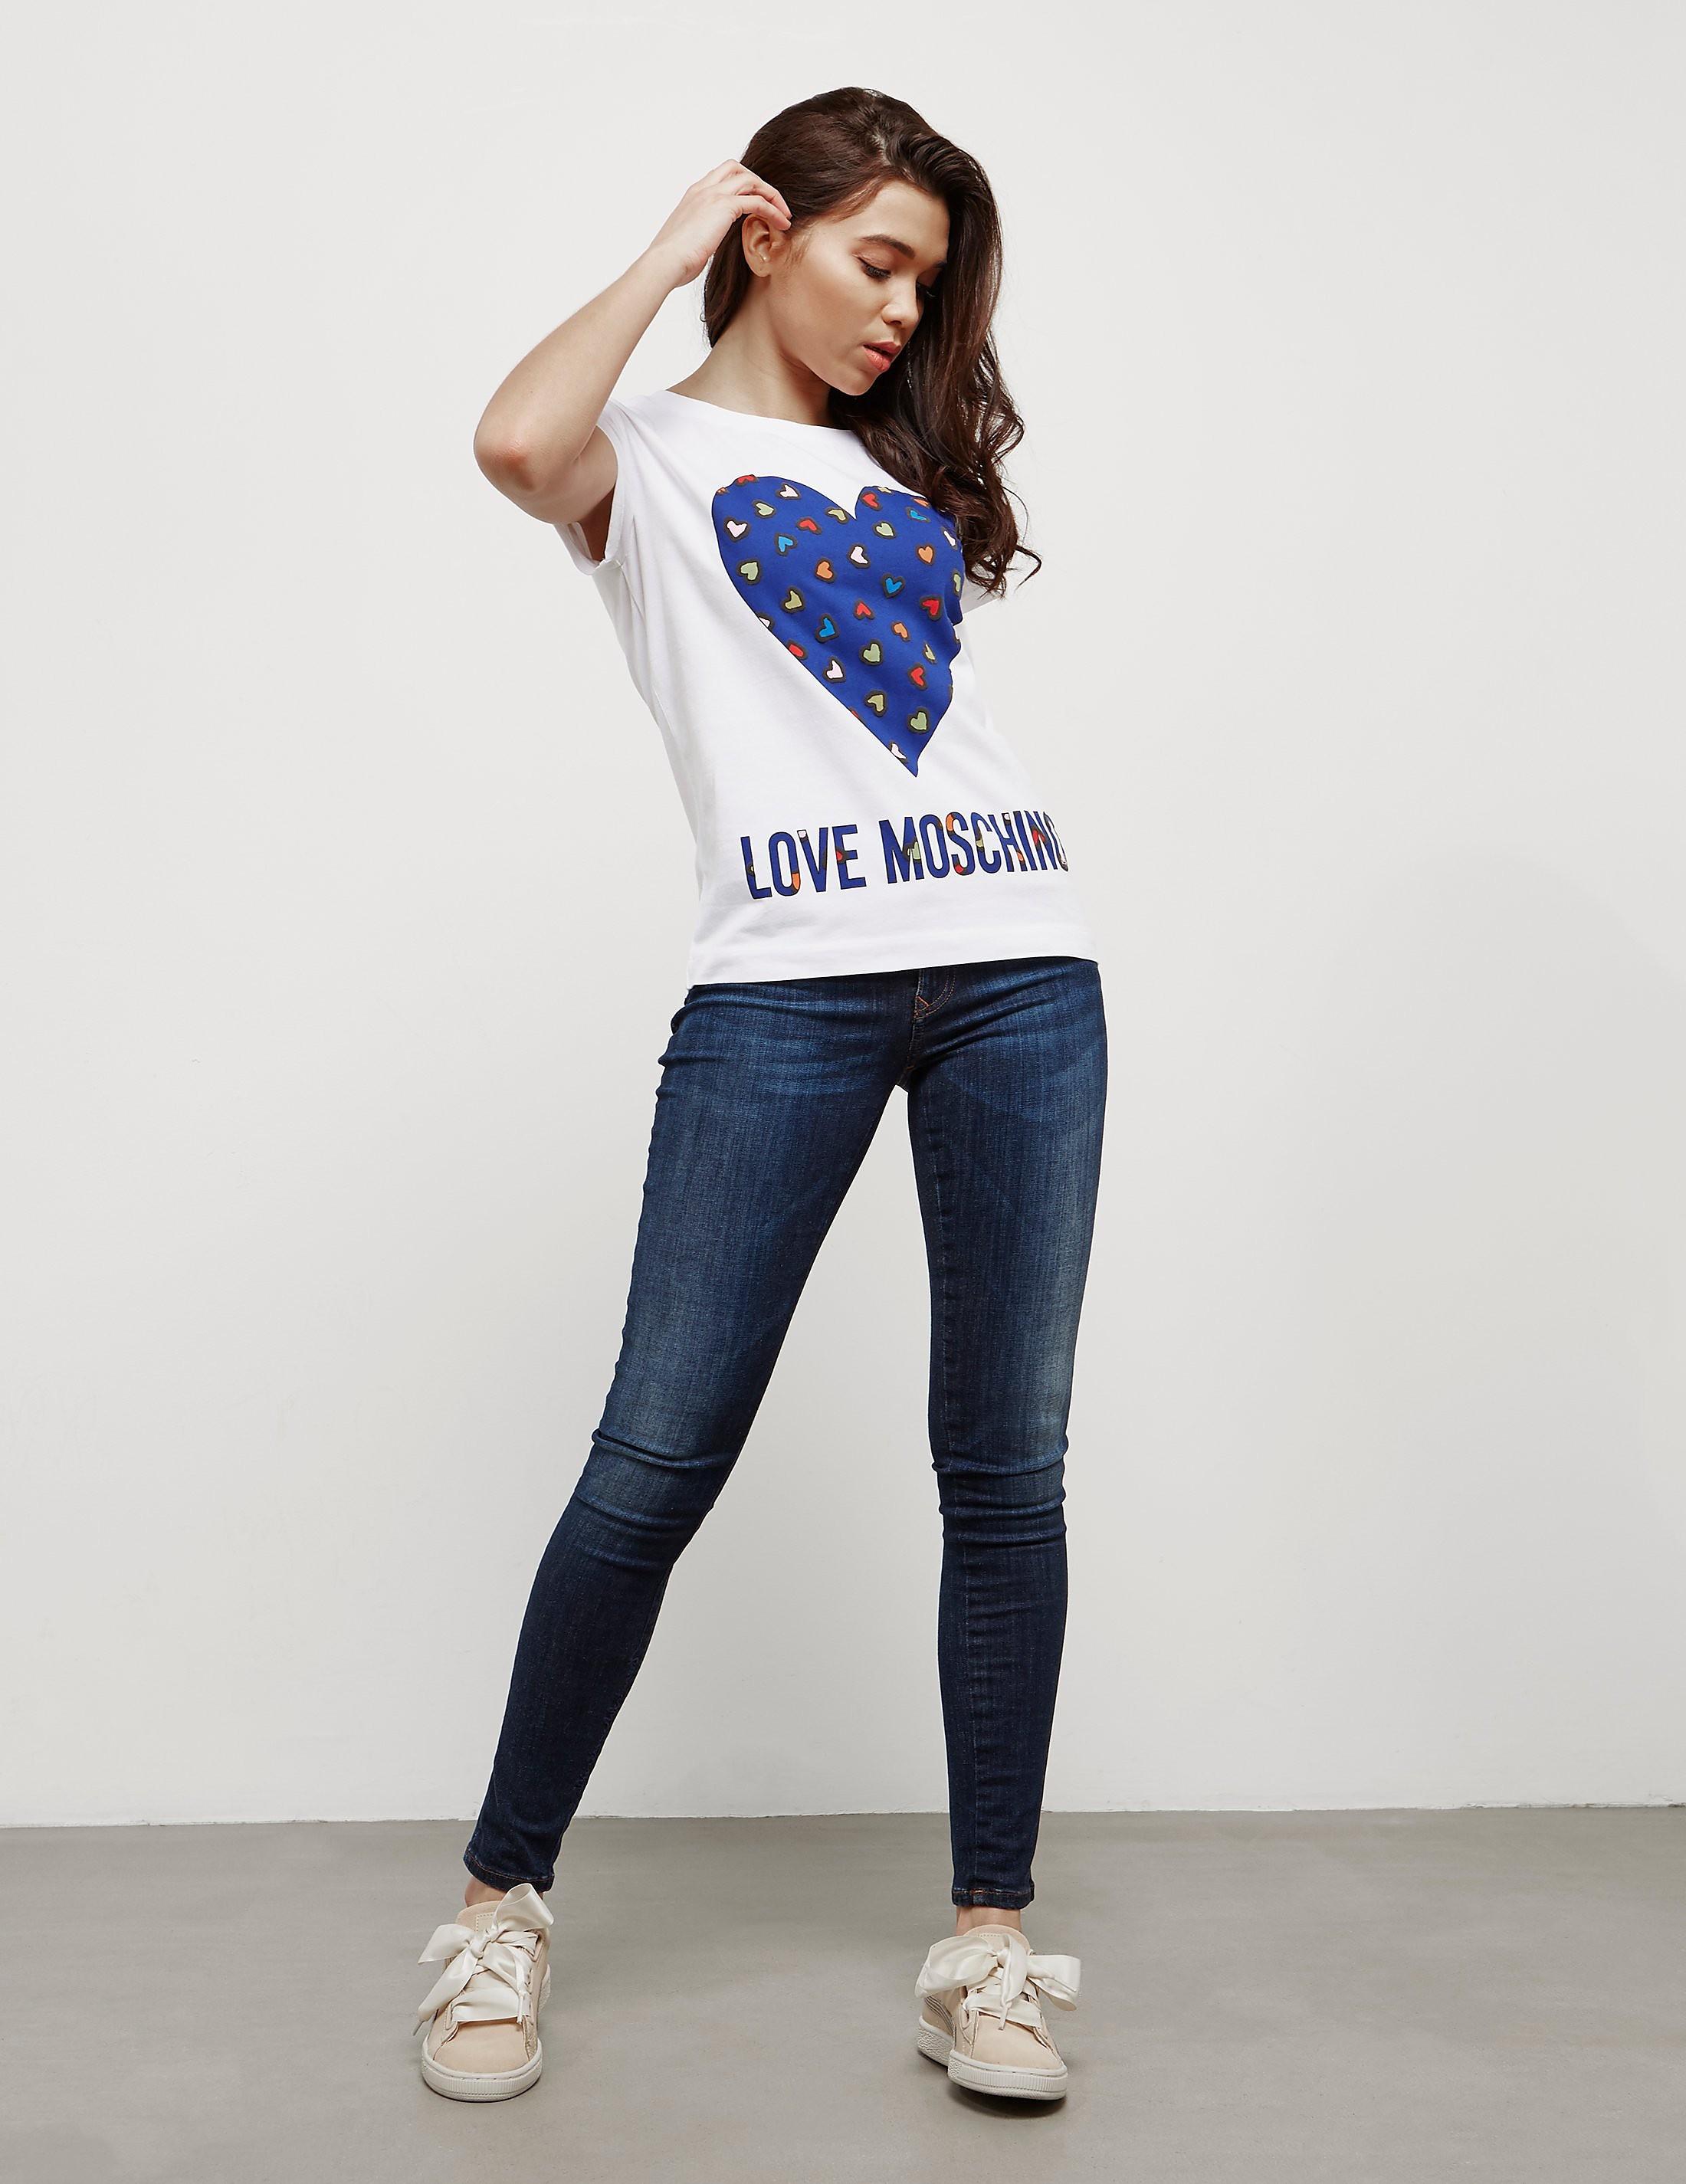 Love Moschino Fun Heart Short Sleeve T-Shirt - Online Exclusive